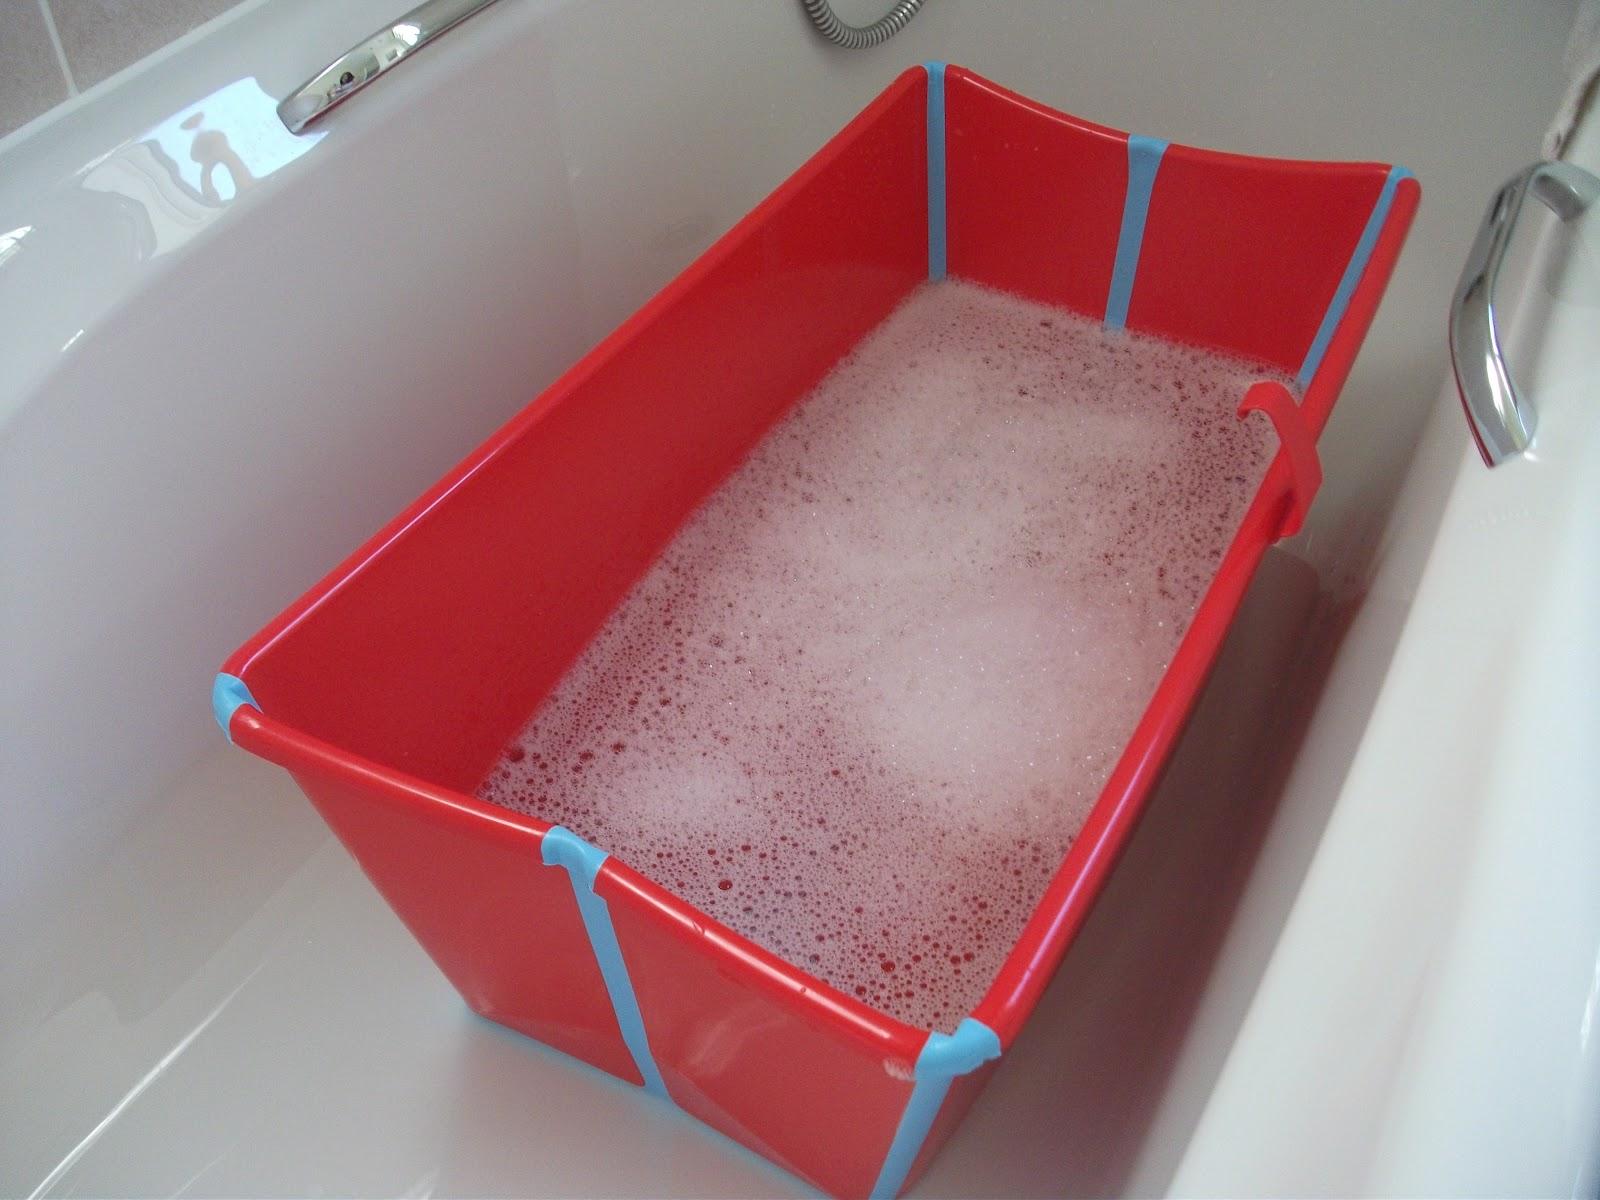 Generous Paint For Bathtub Tall Painting Bathtub Shaped Bath Refinishing Service How To Paint A Tub Youthful Paint Tub Dark Tub Refinishers